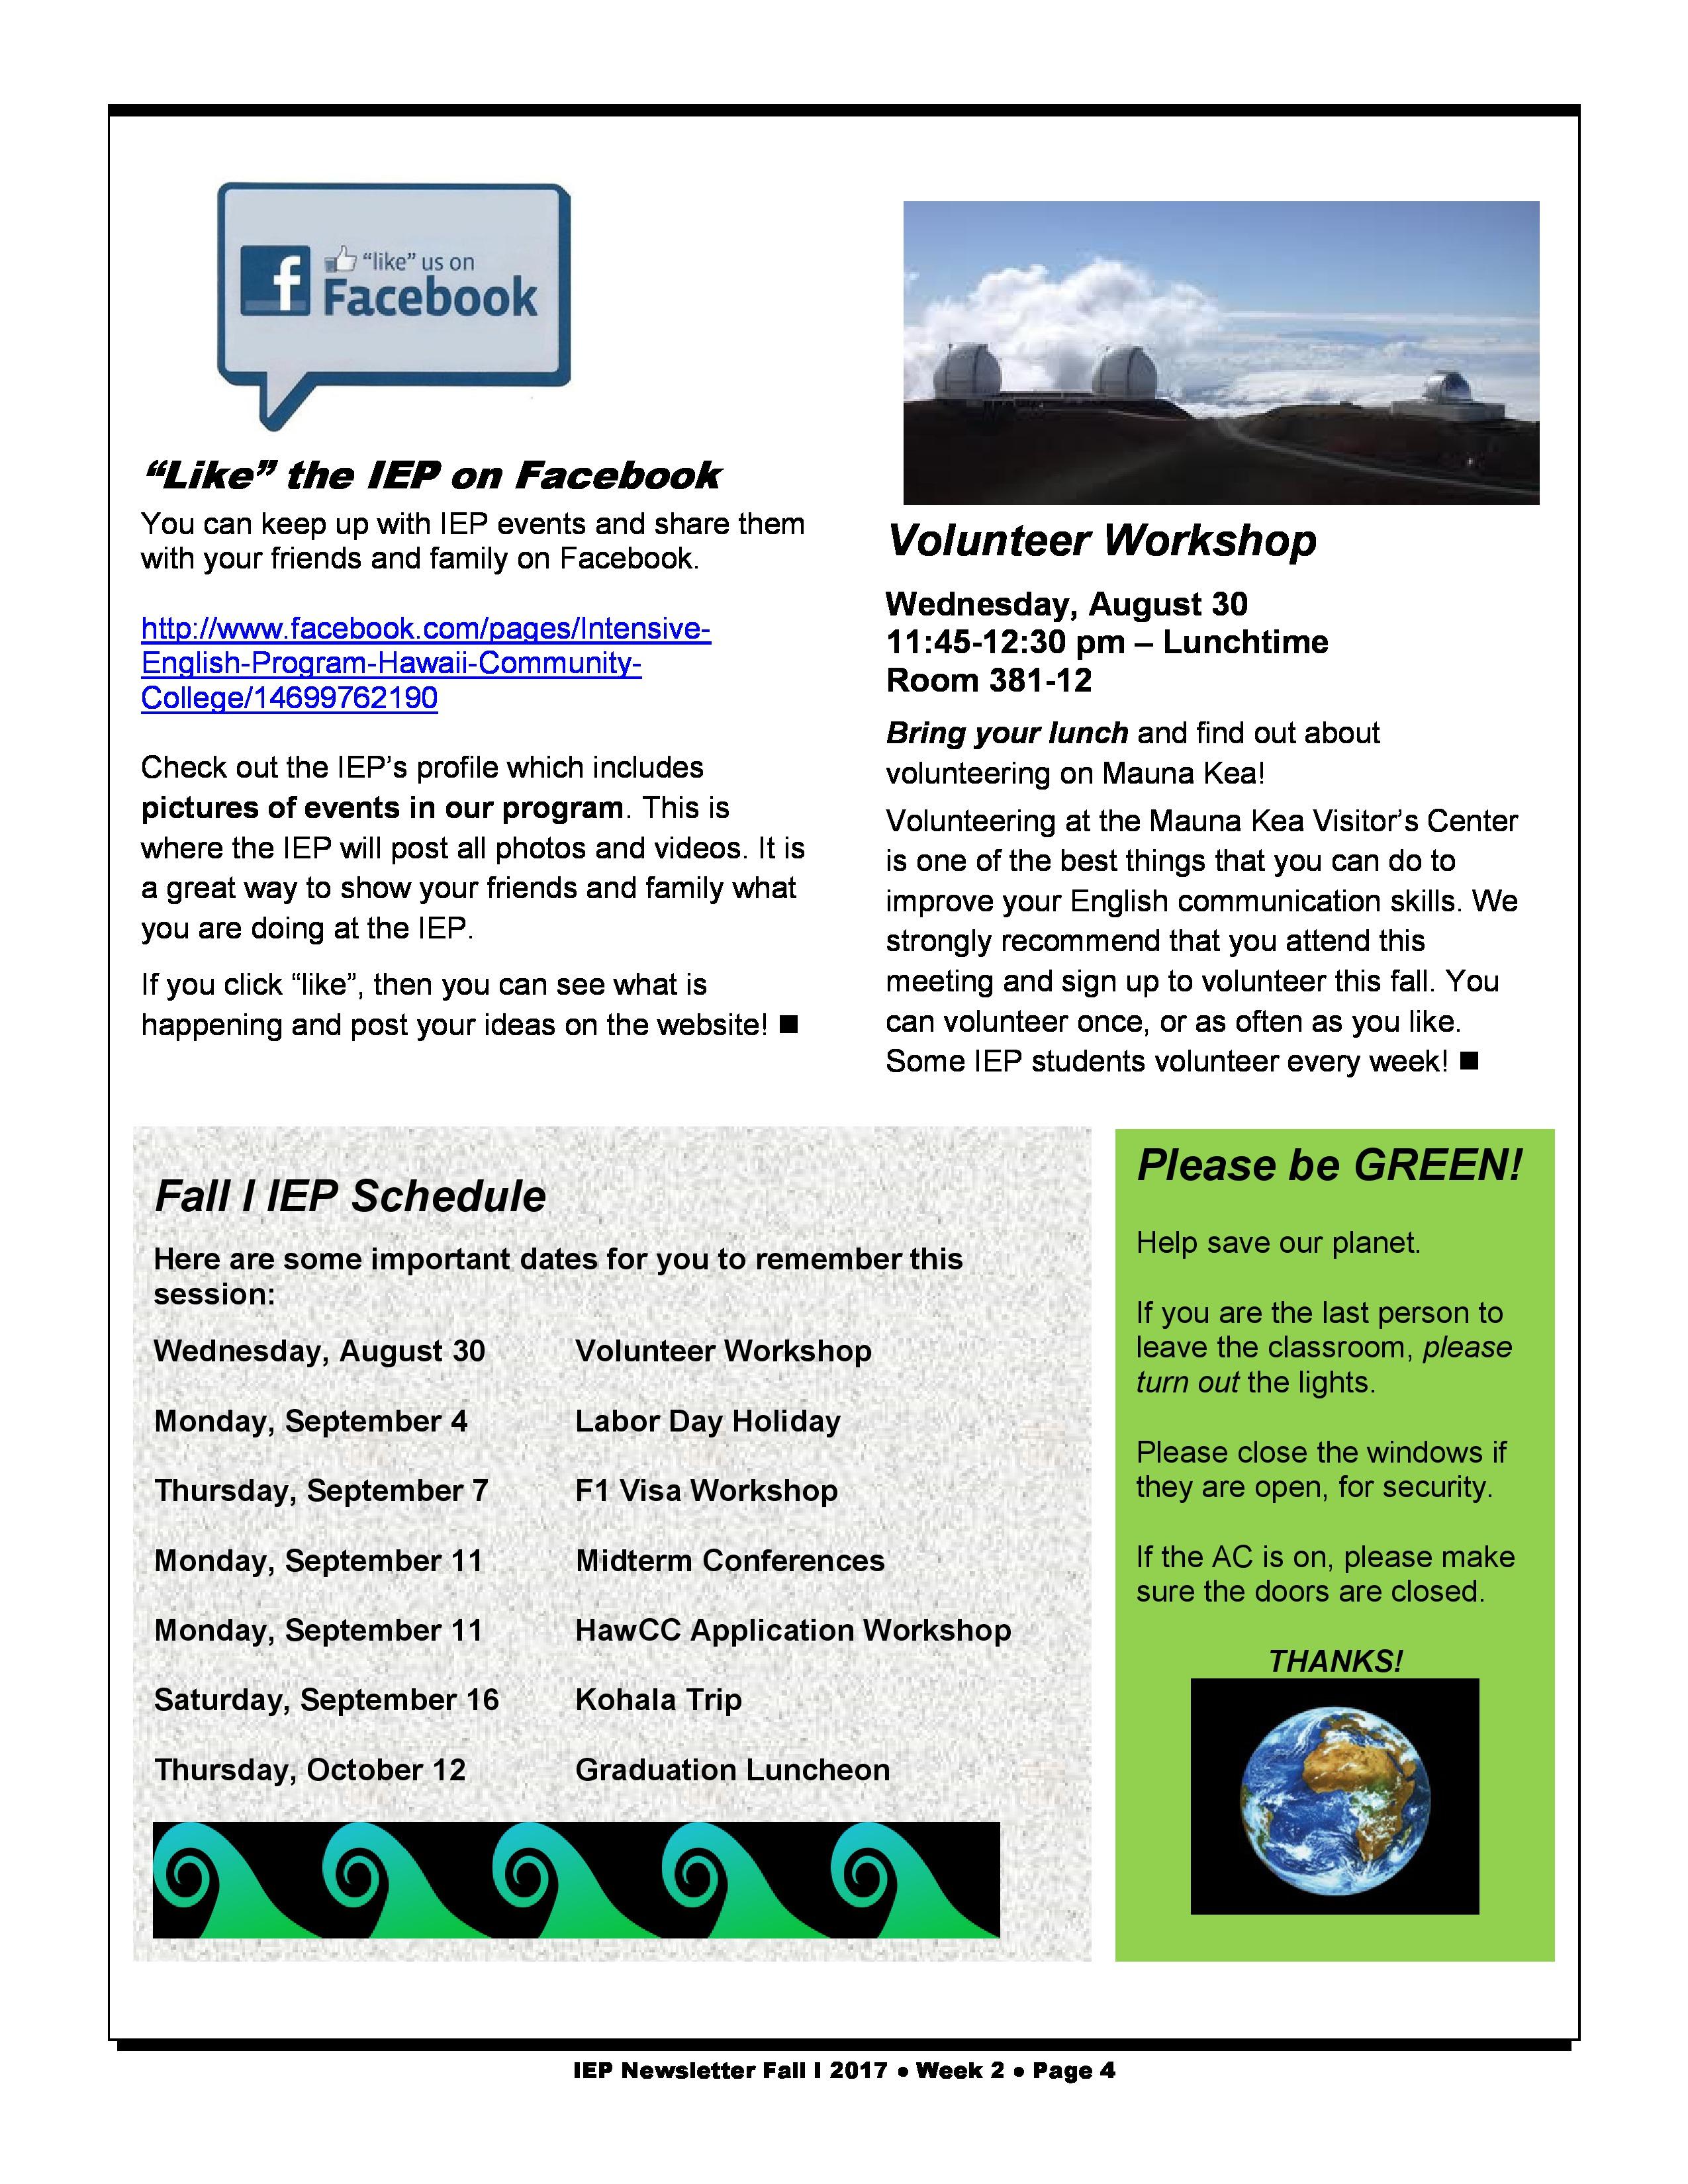 IEP Newsletter Week 2 Fall I 2017 - Intensive English Program - Hawaiʻi Community College